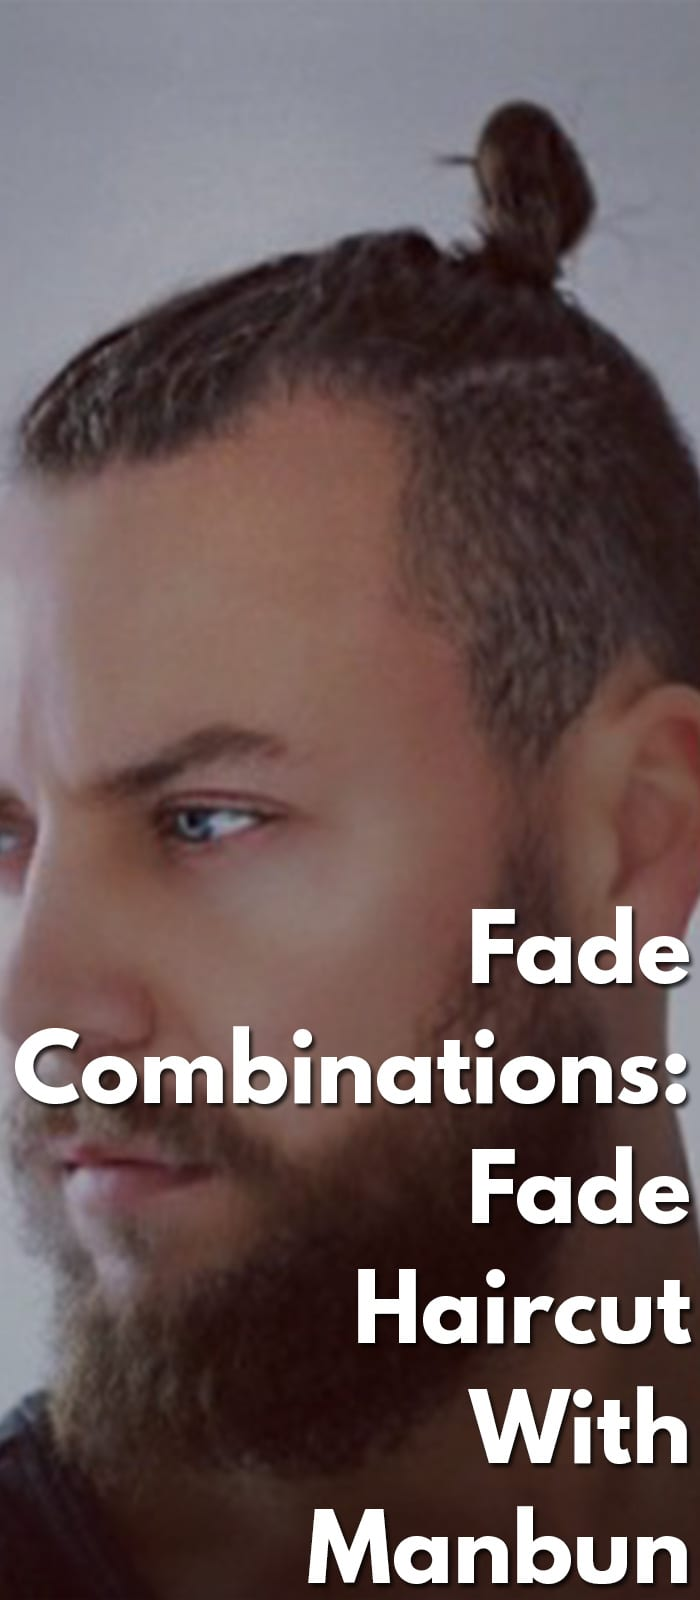 Fade-Combinations-Fade-Haircut-With-Manbun.